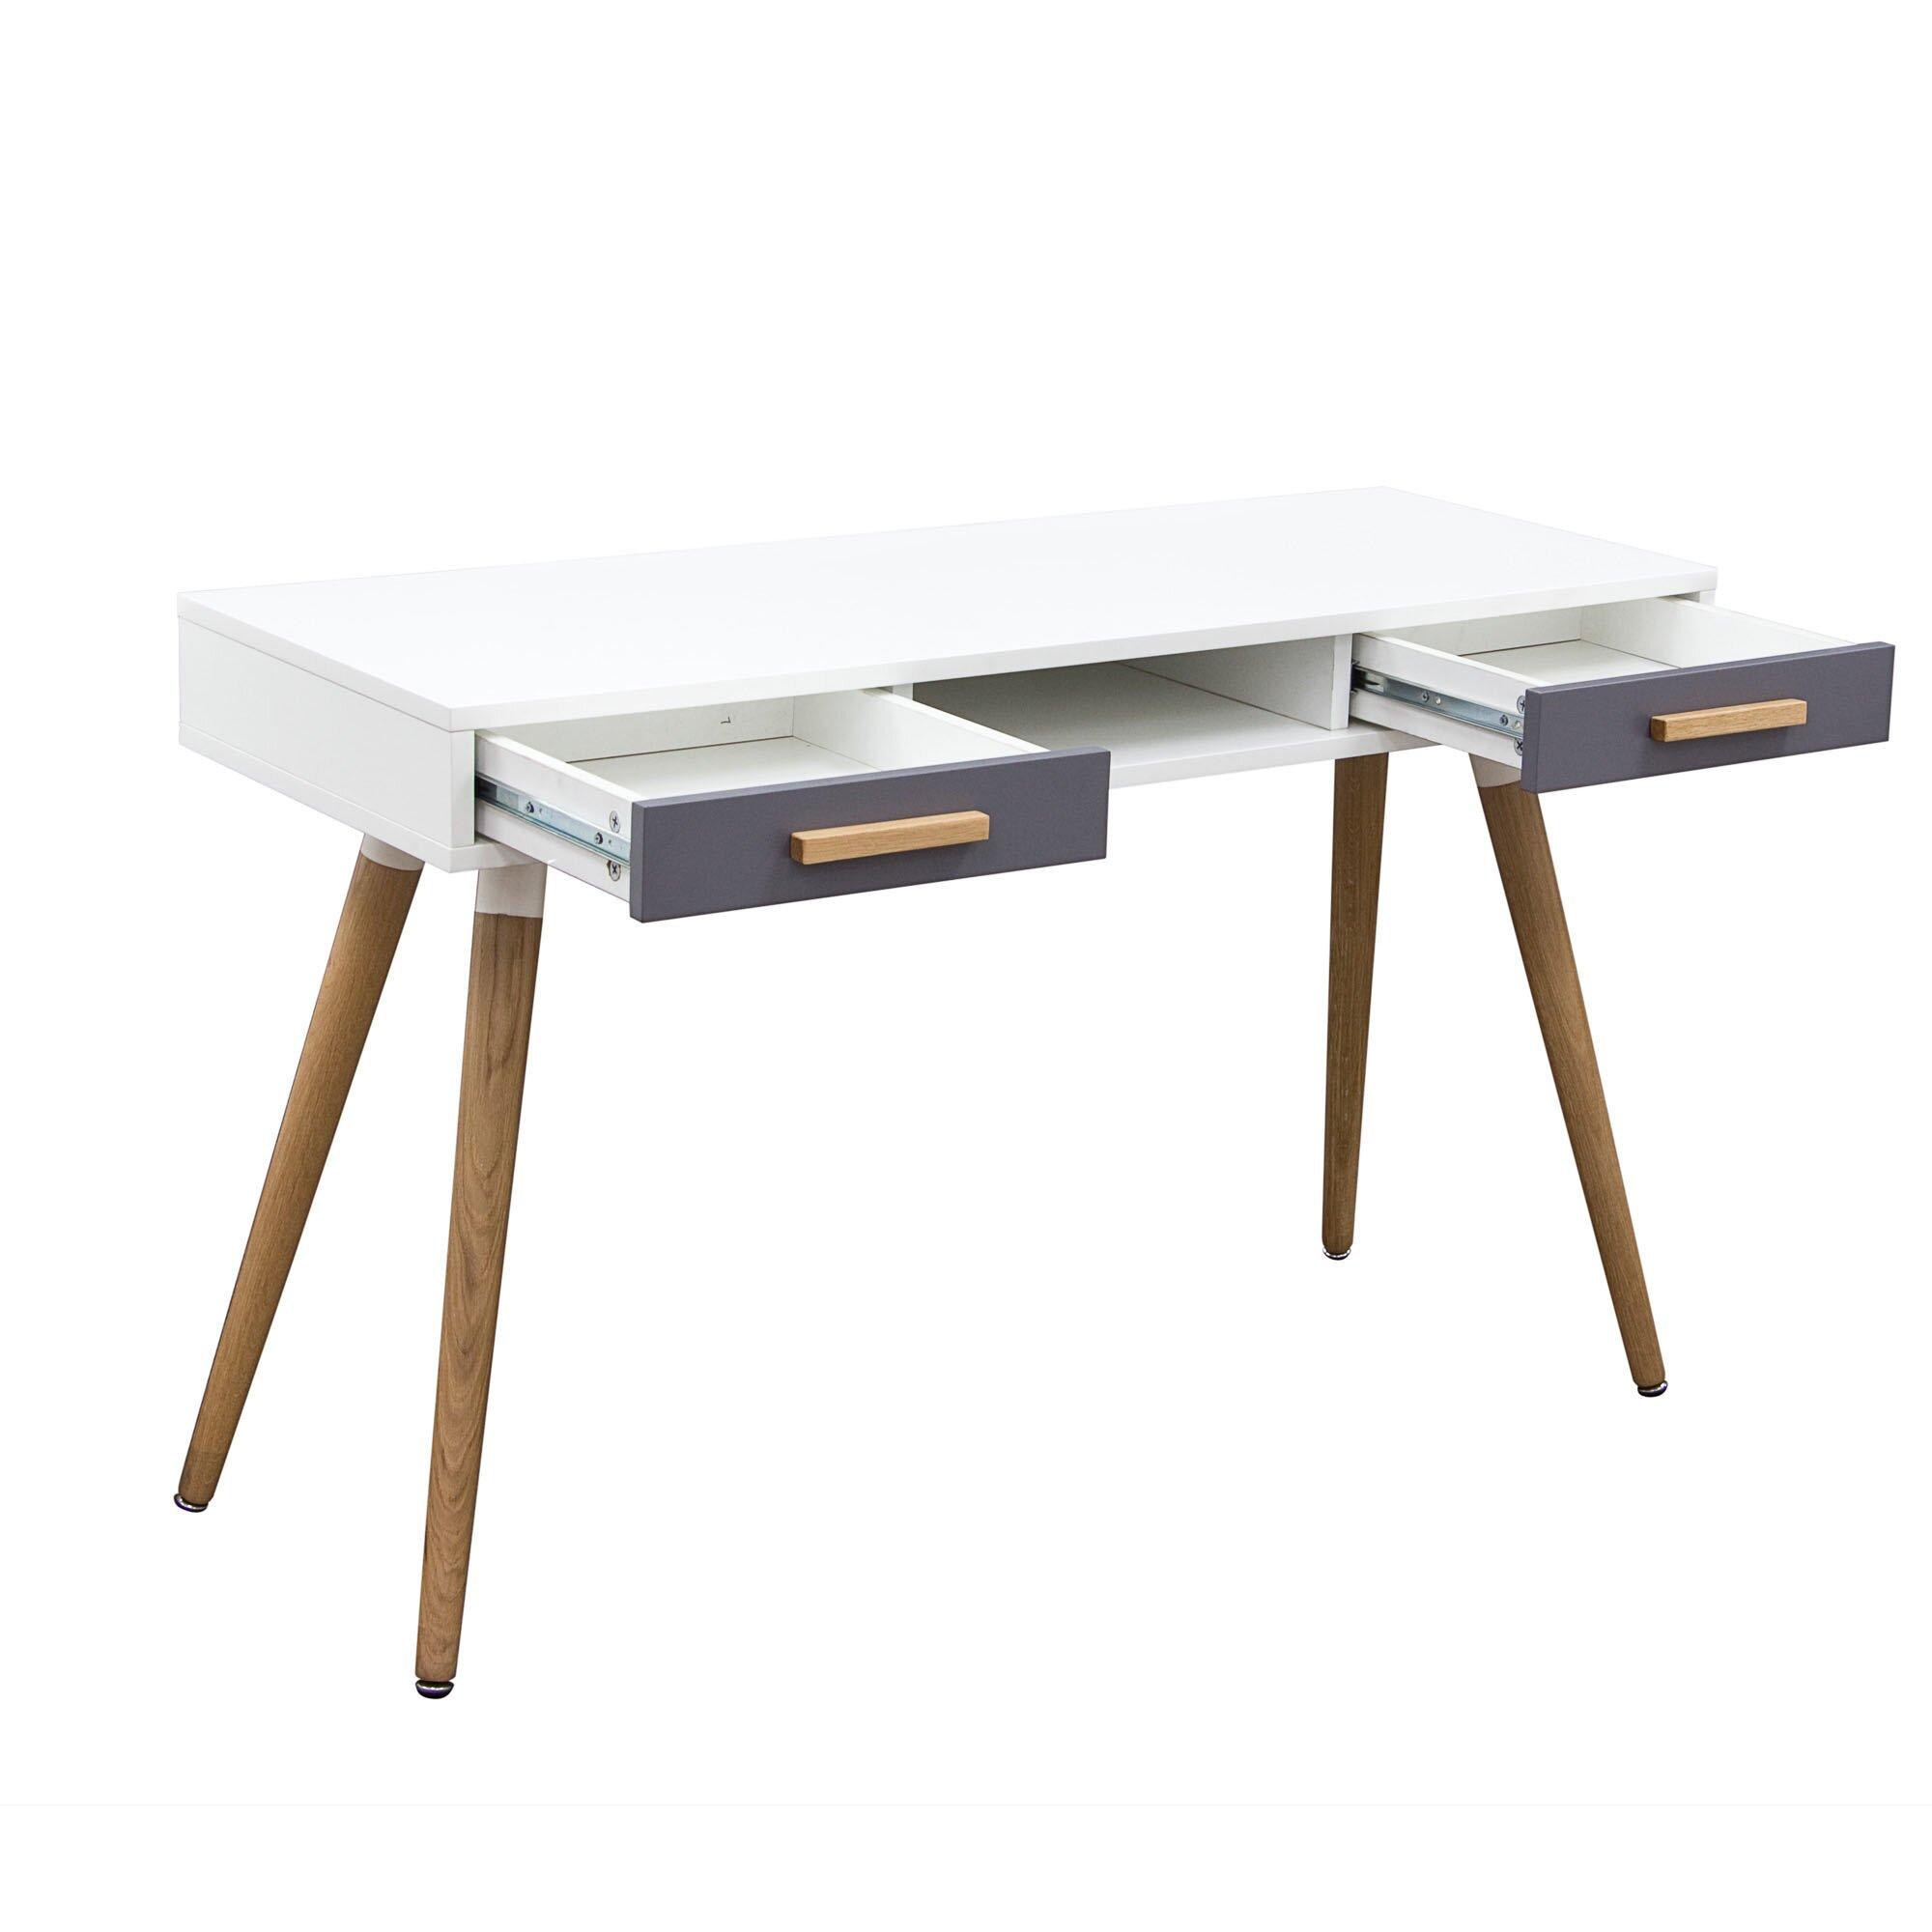 retro writing desk Buy white writing desk products like crosley campbell writing desk in white, southern enterprises aiden writing desk  walker edison's retro modern writing desk.